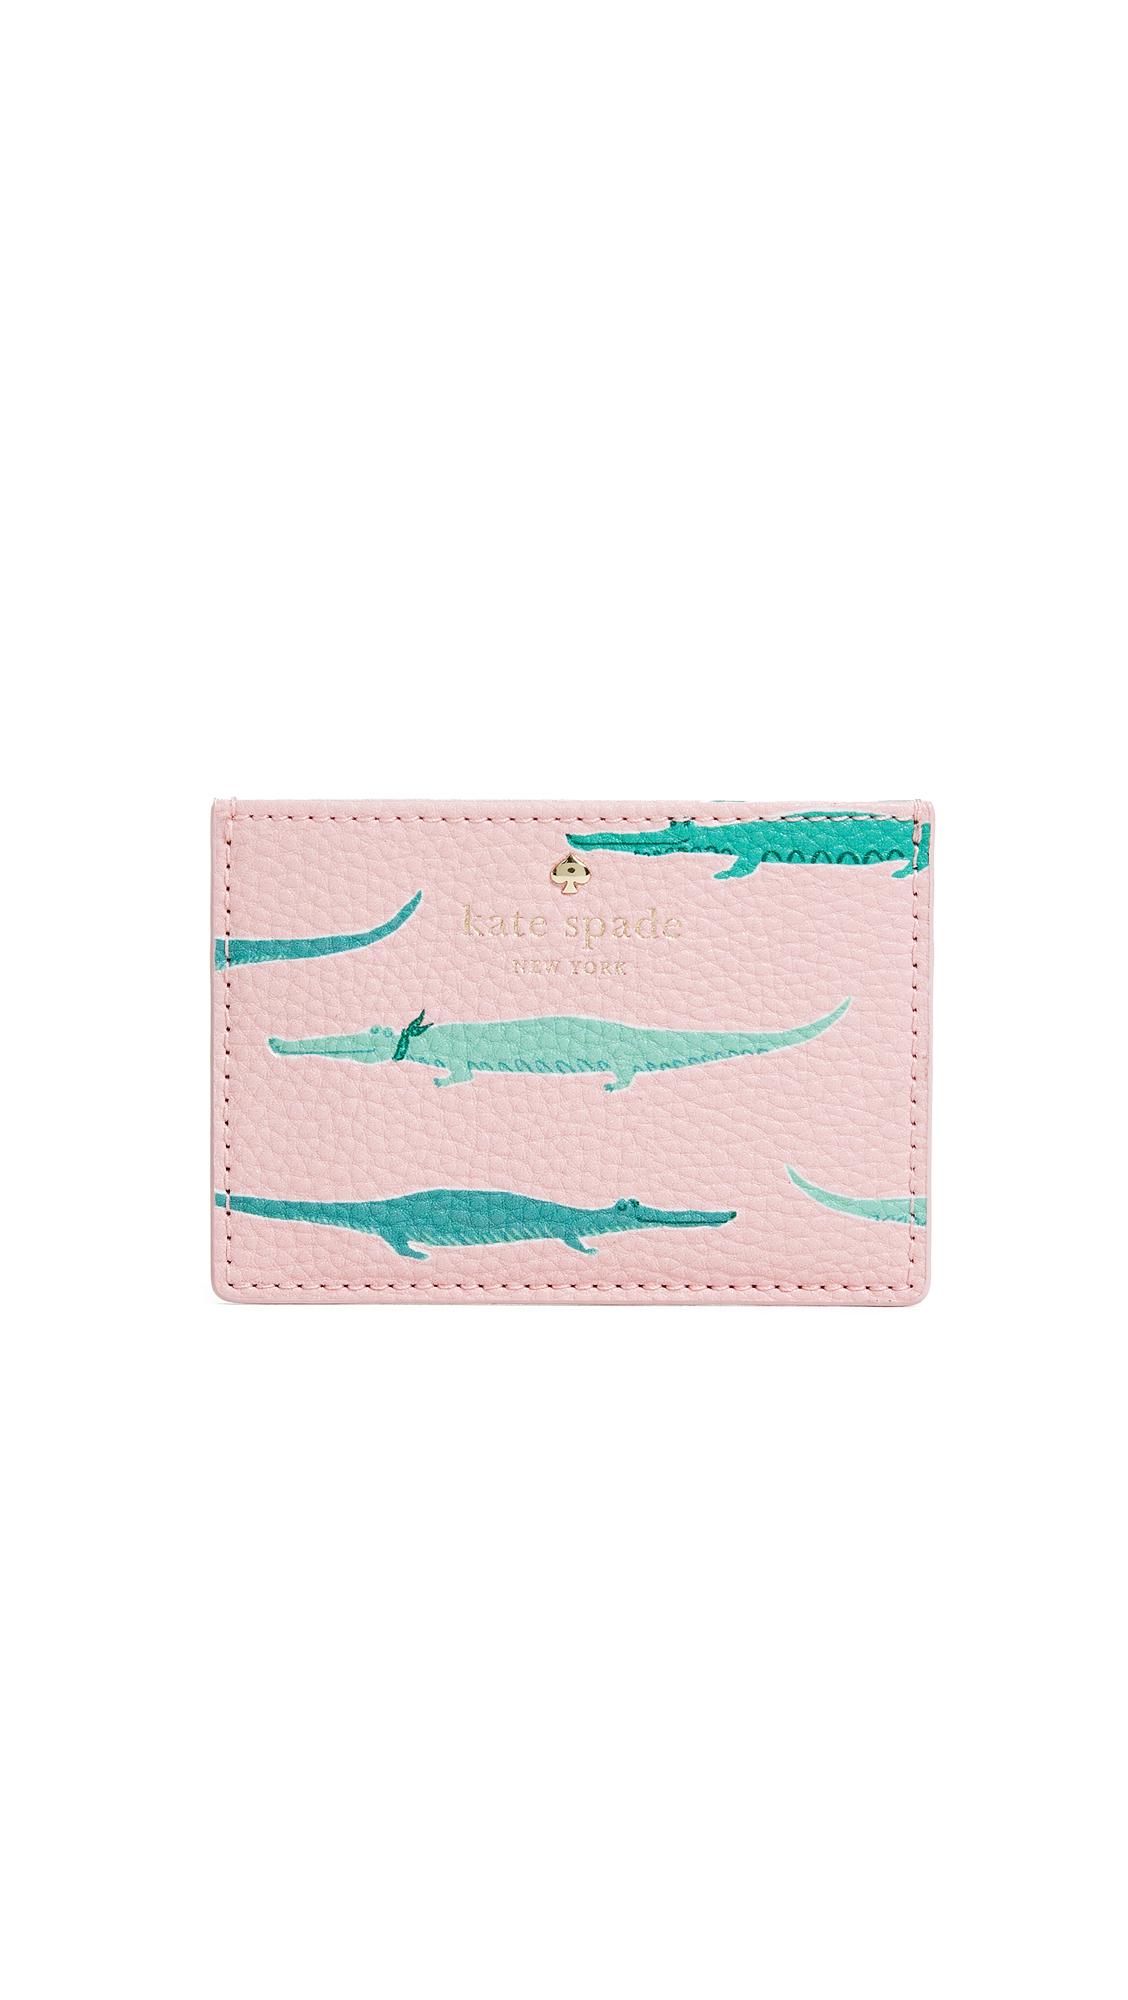 Kate Spade New York Swamped Card Holder - Pink Majolica